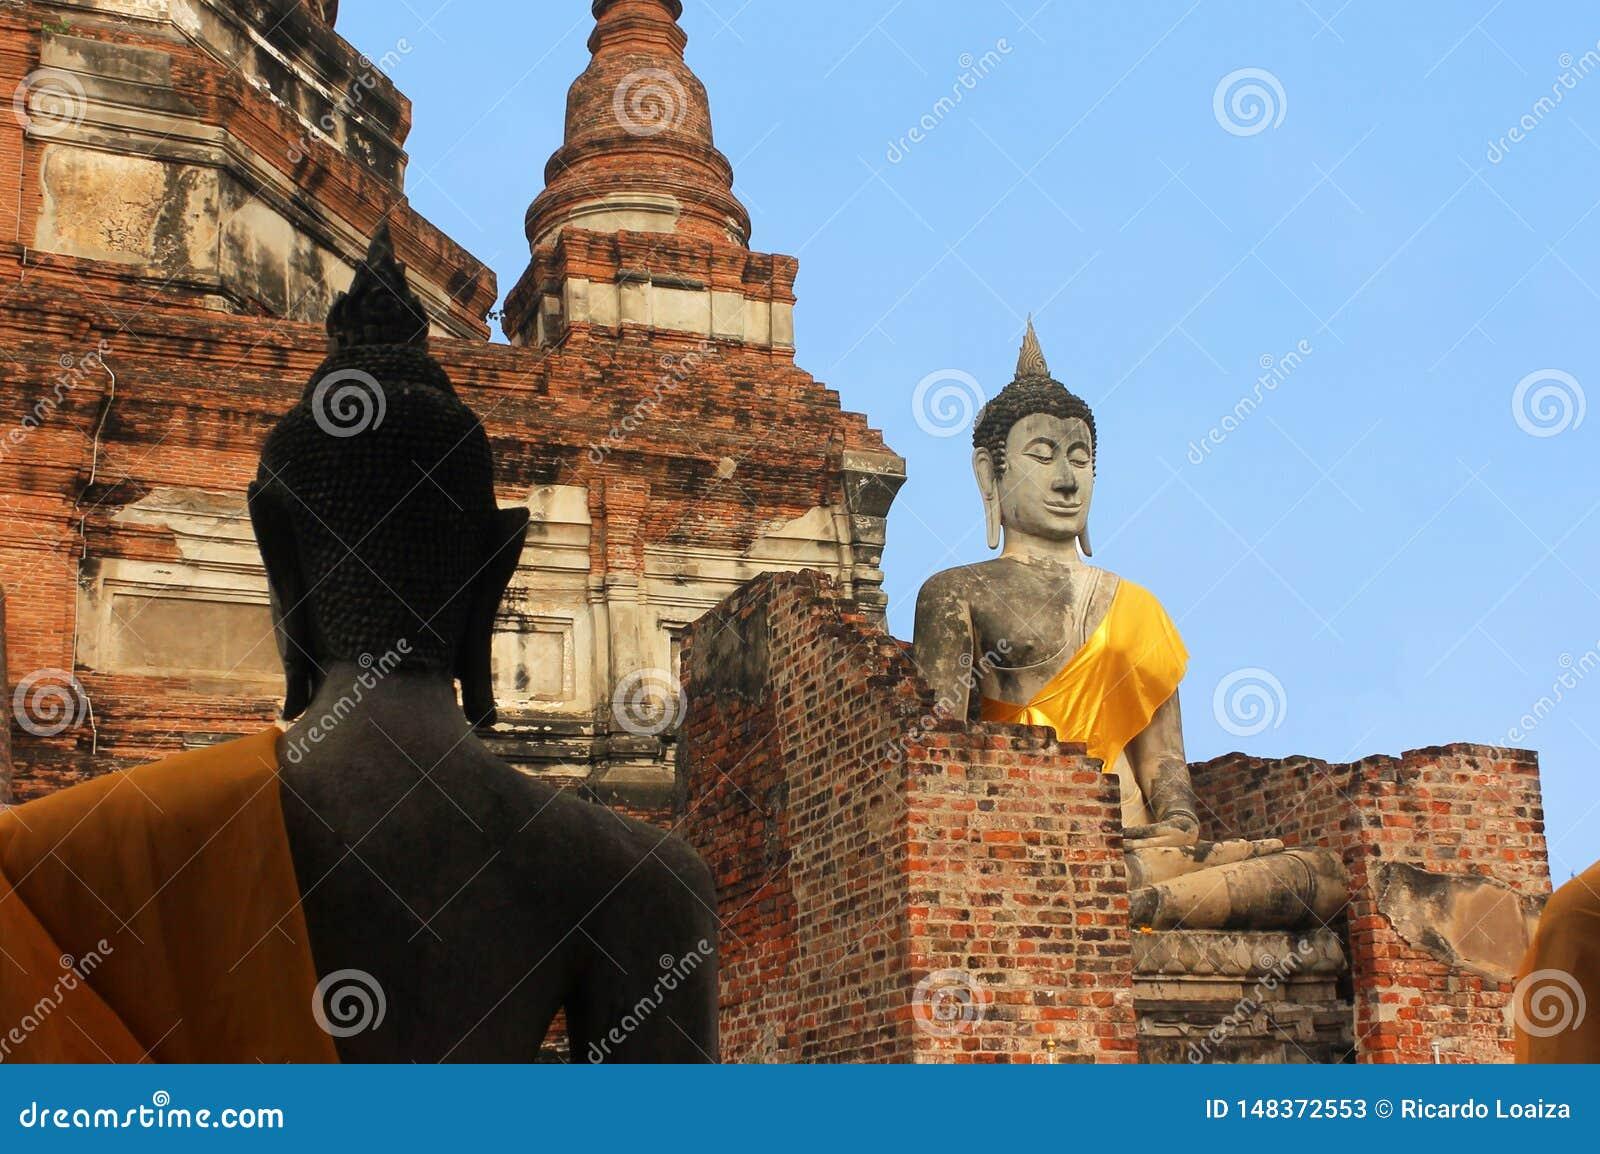 Big Buddha statues in the ancient temple Wat Phra Sri Sanphe. Ayutthaya, Thailand.